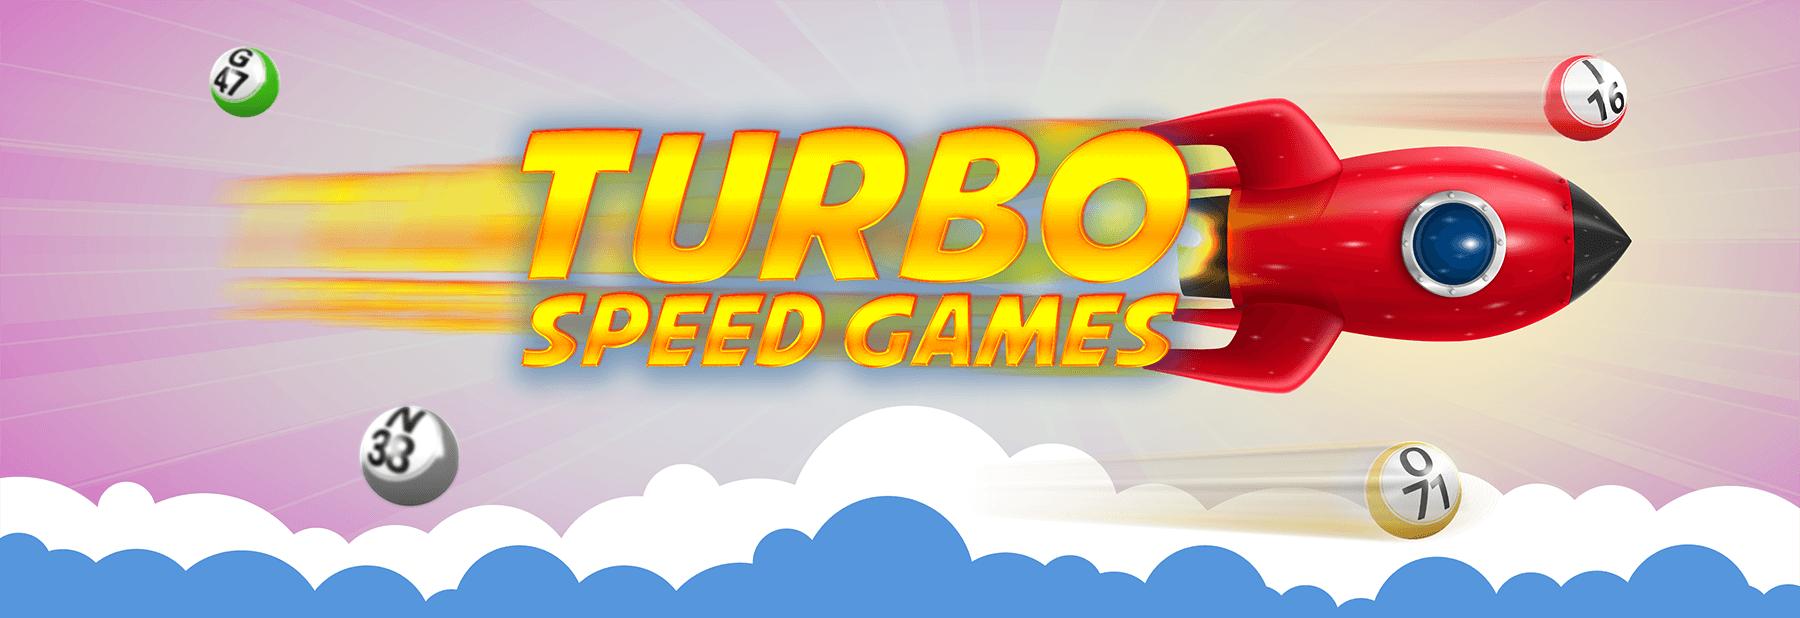 TurboGames